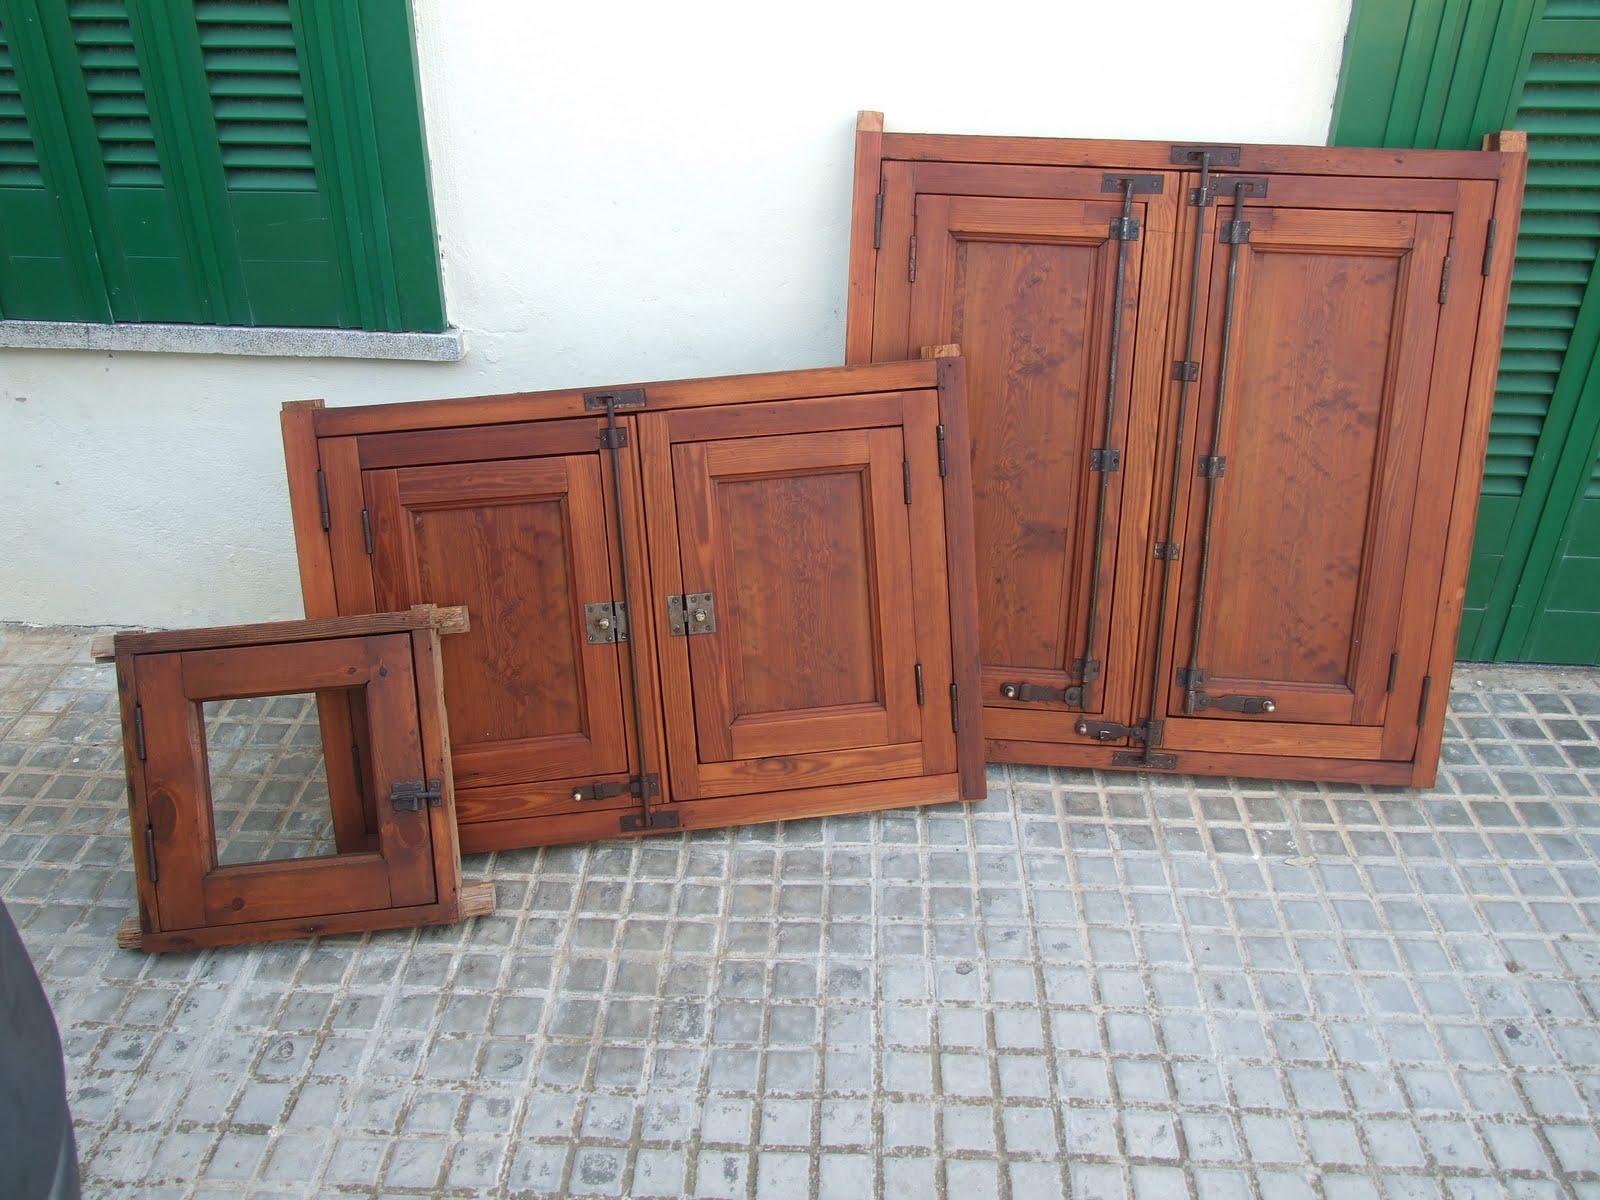 Ventana a lo escultórico: ventanas de madera del norte